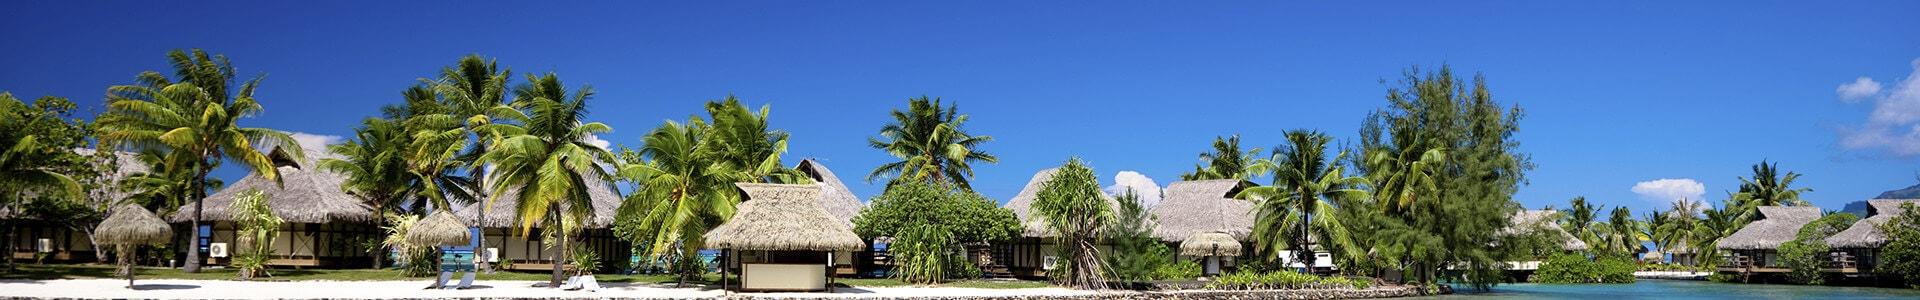 Voyage en Polynesie Francaise - TUI